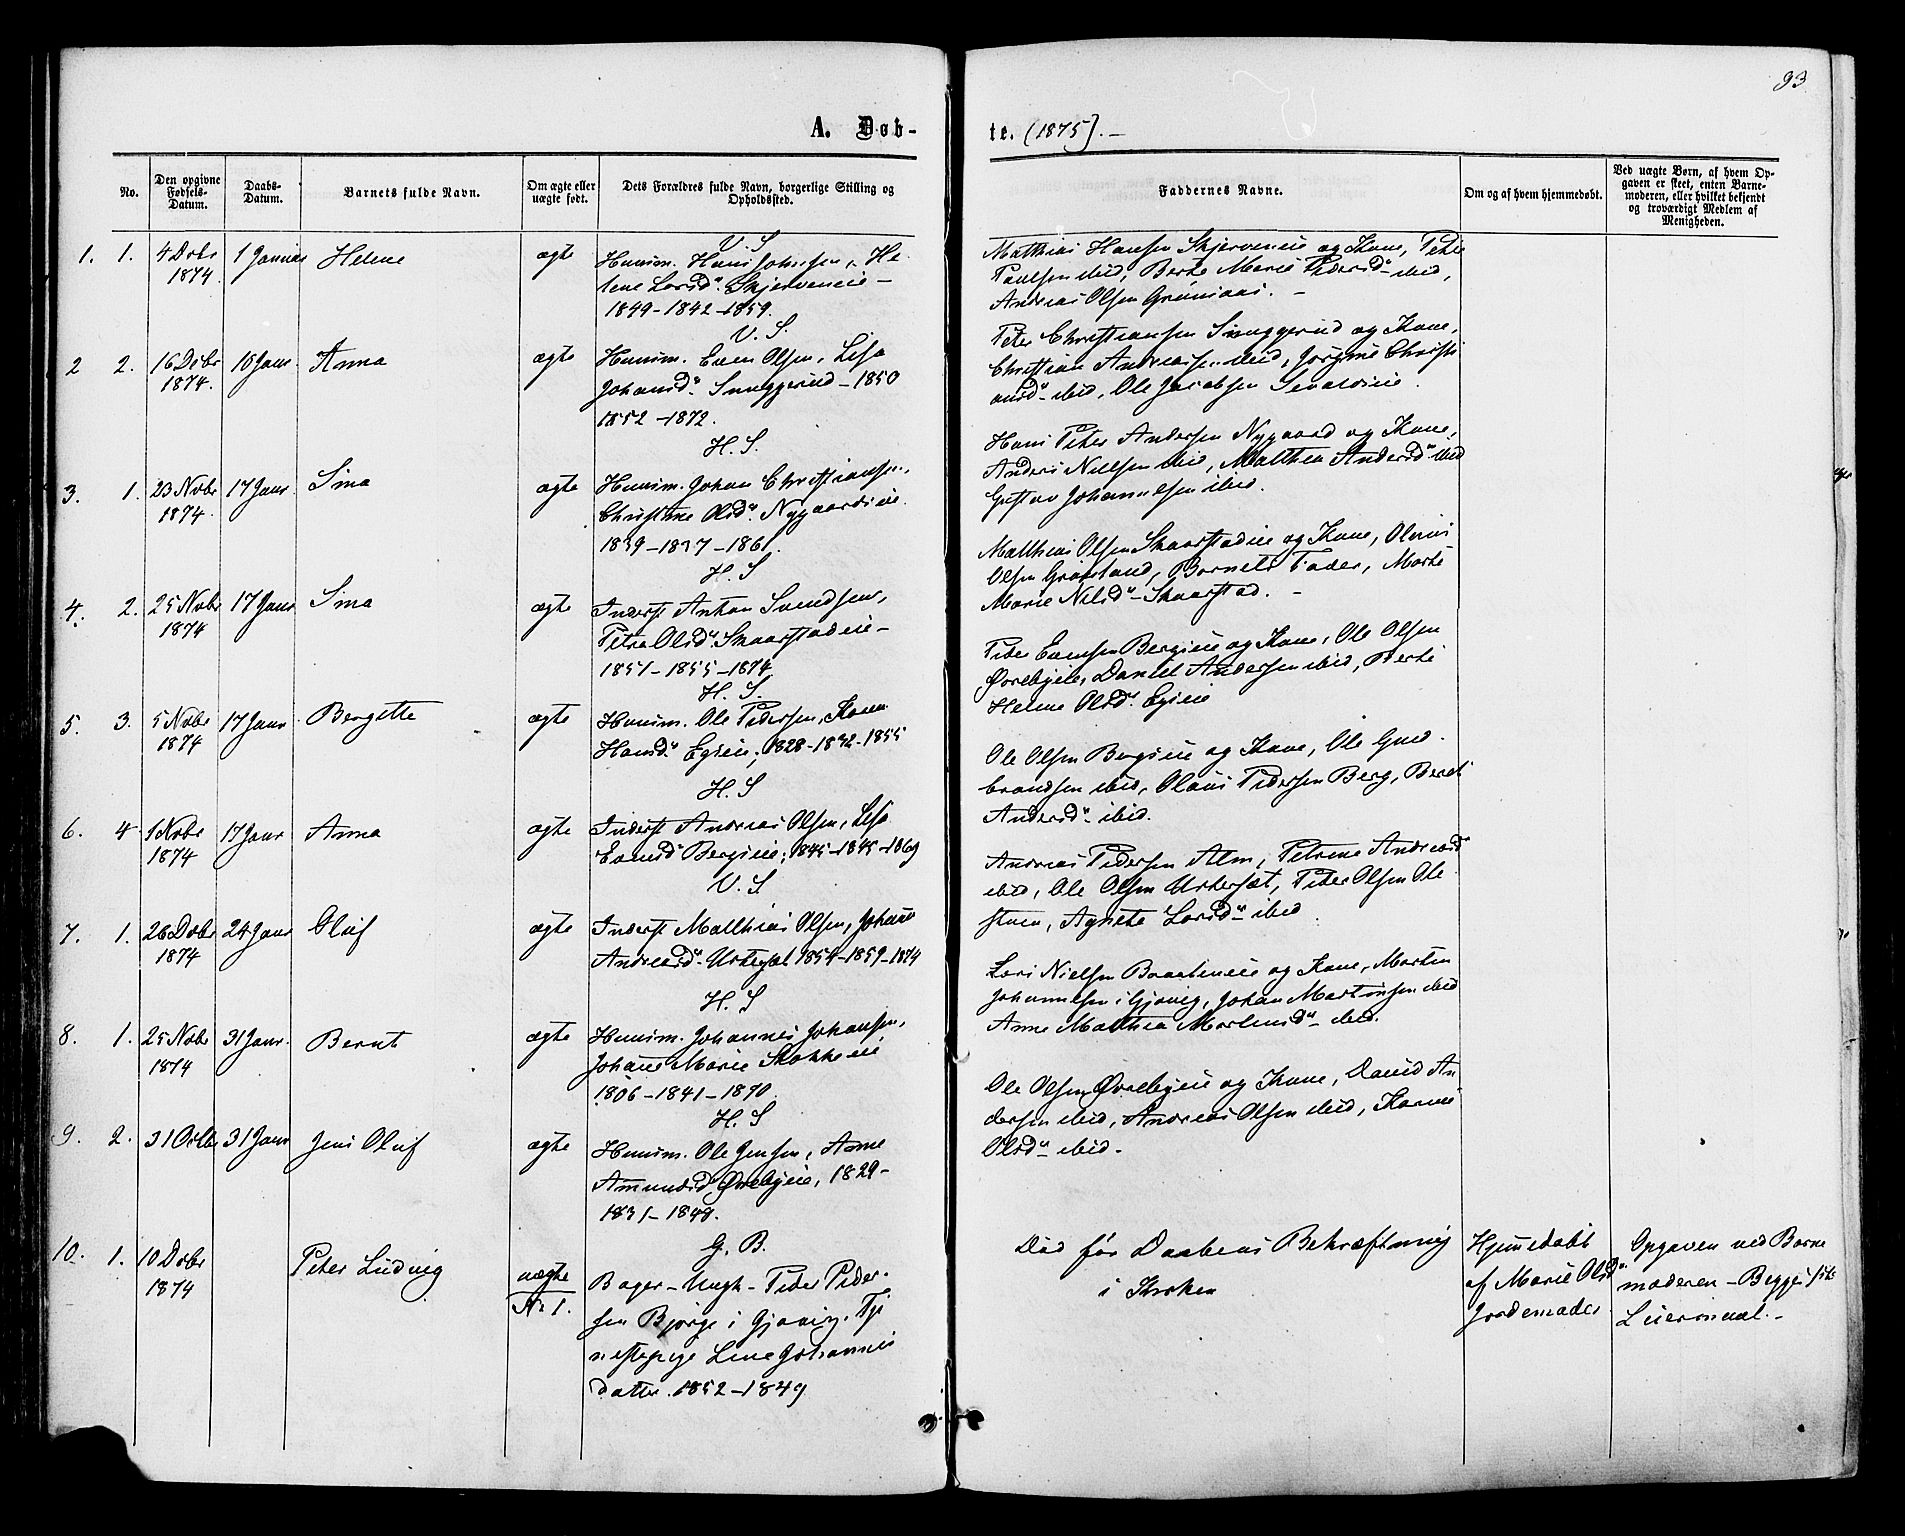 SAH, Vardal prestekontor, H/Ha/Haa/L0007: Ministerialbok nr. 7, 1867-1878, s. 93